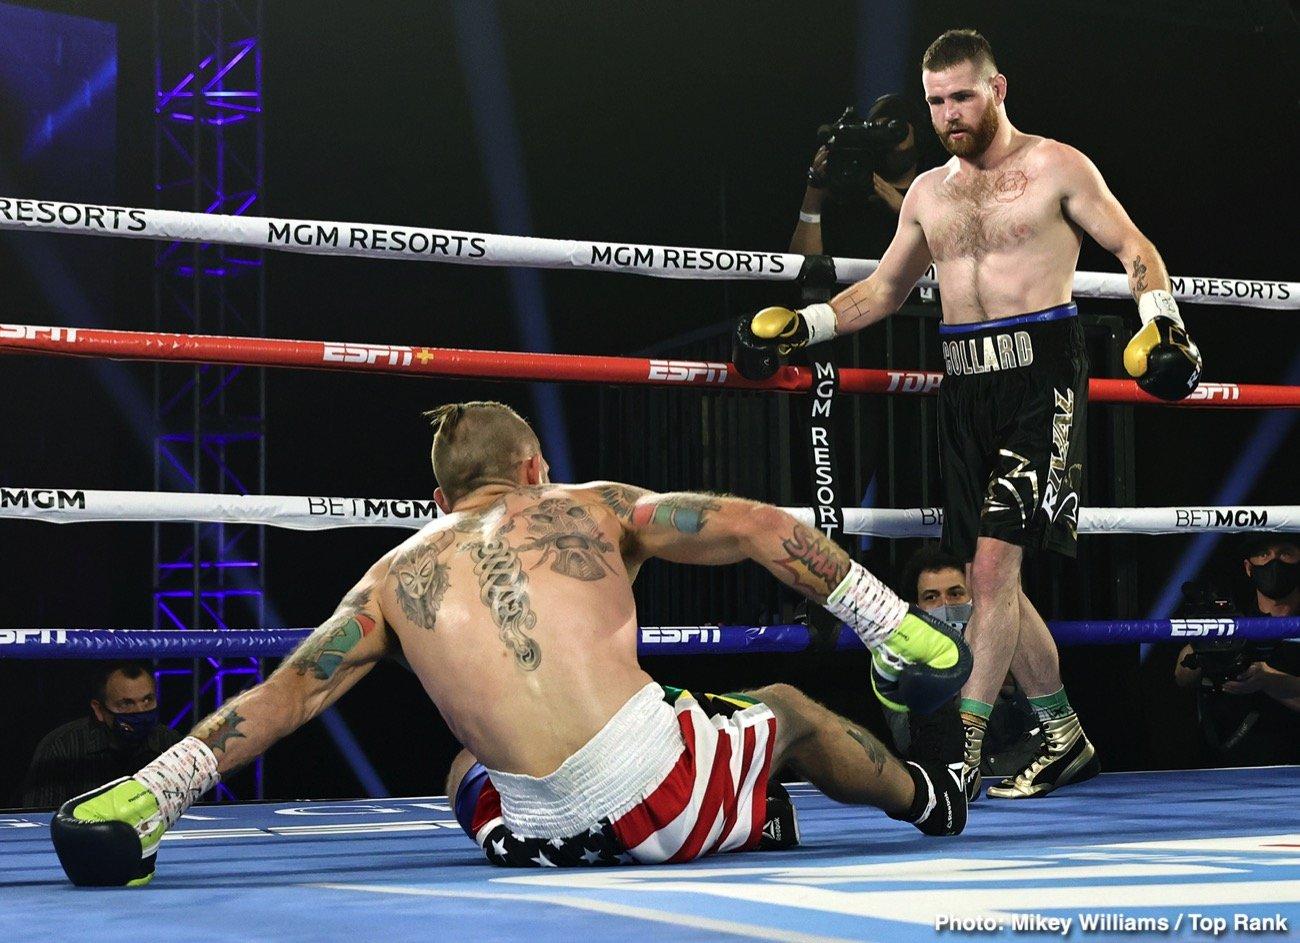 Anthony Joshua, Canelo Alvarez, Edgar Berlanga, Errol Spence Jr., Gervonta Davis, Teofimo Lopez, Tyson Fury - Boxing News